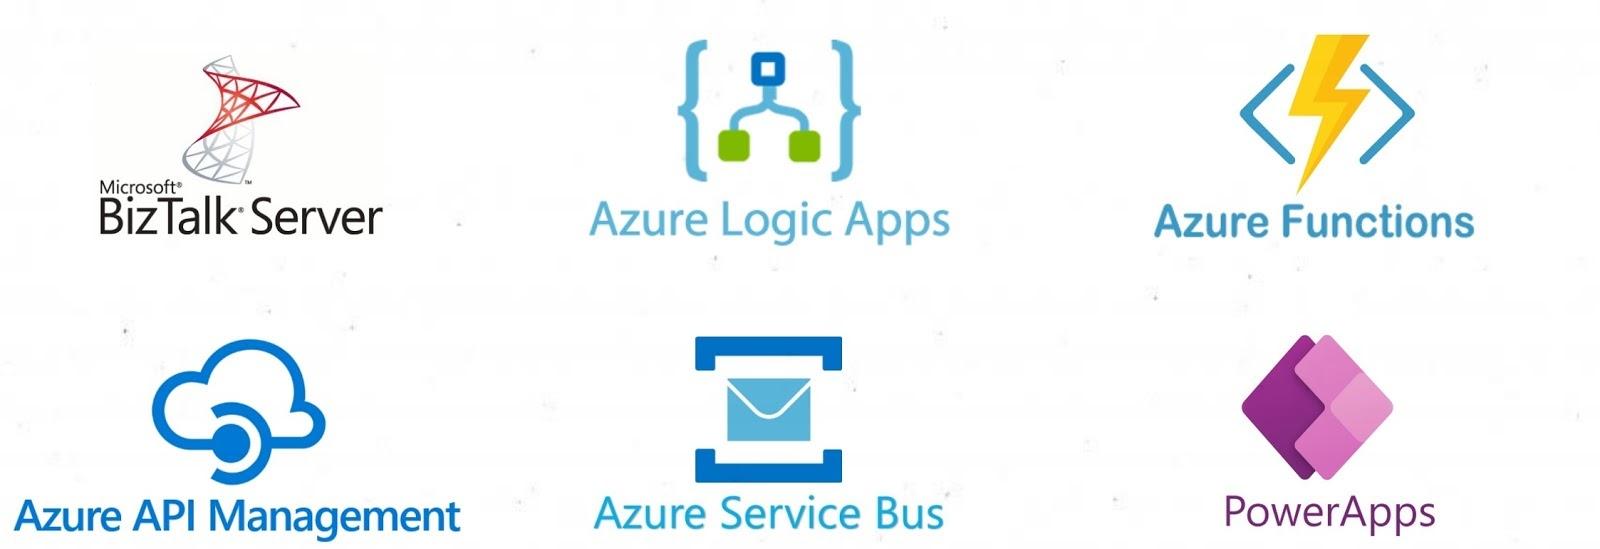 February 22, 2021 Weekly Update on Microsoft Integration Platform & Azure iPaaS